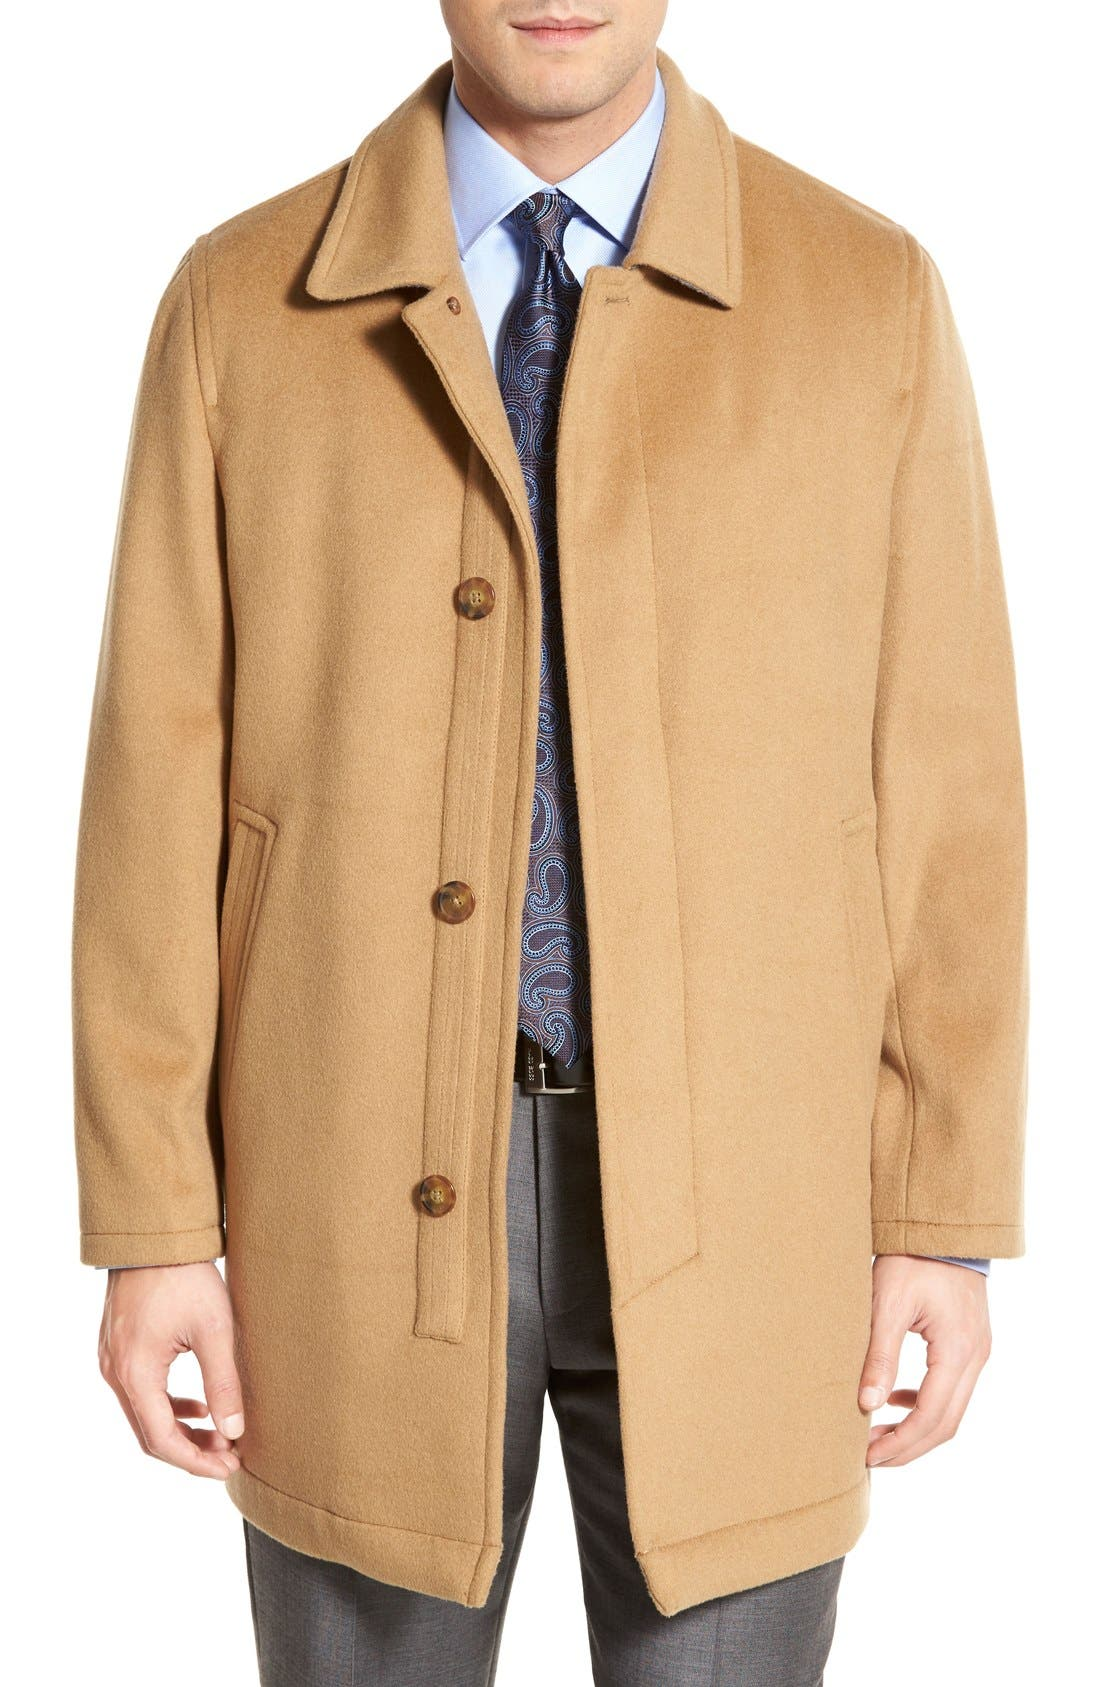 Hart Schaffner Marx 'Douglas' Classic Fit Wool & Cashmere Overcoat